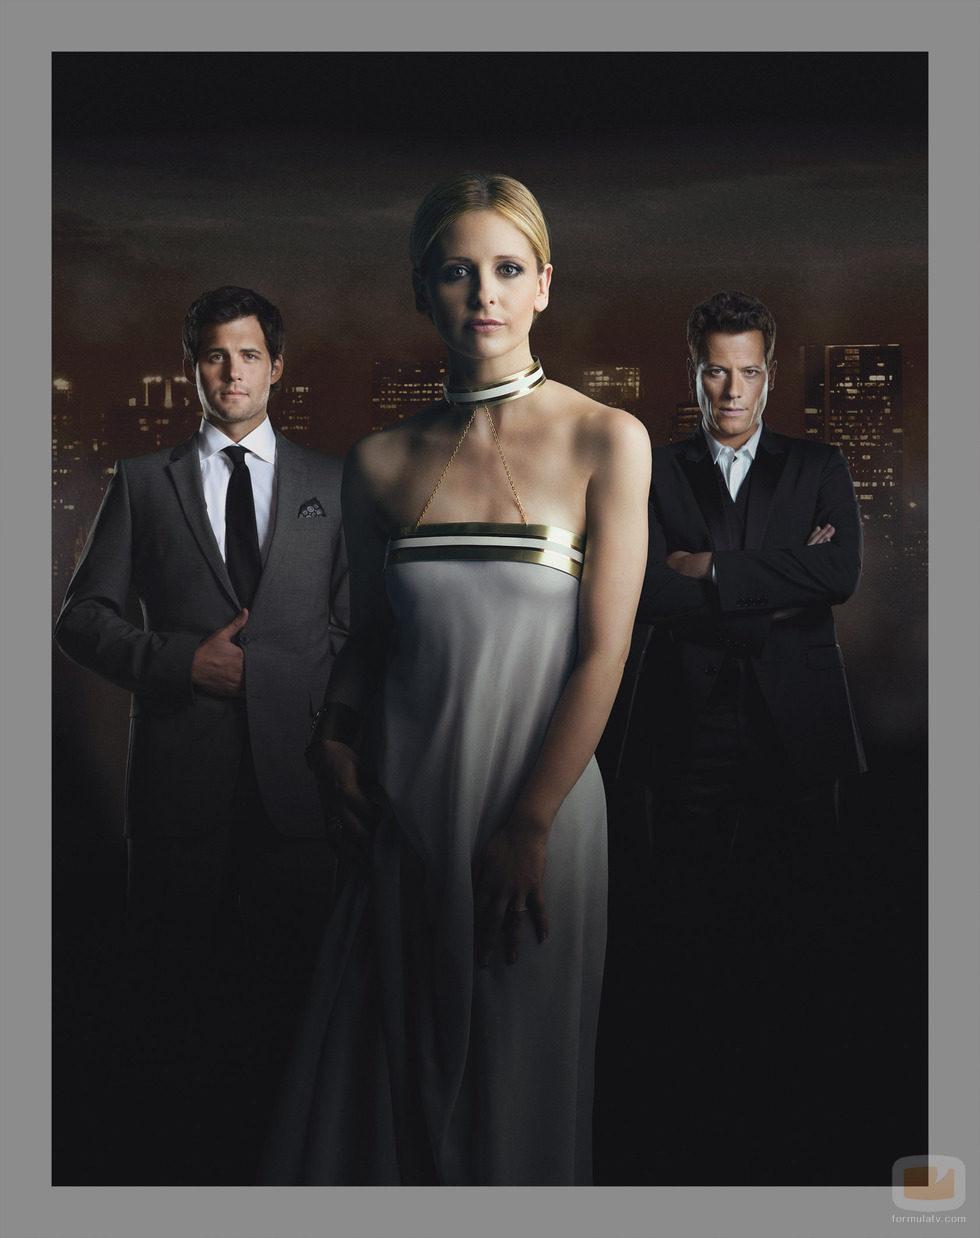 Andrew, Henry y Siobhan (Bridget) de la serie 'Ringer'